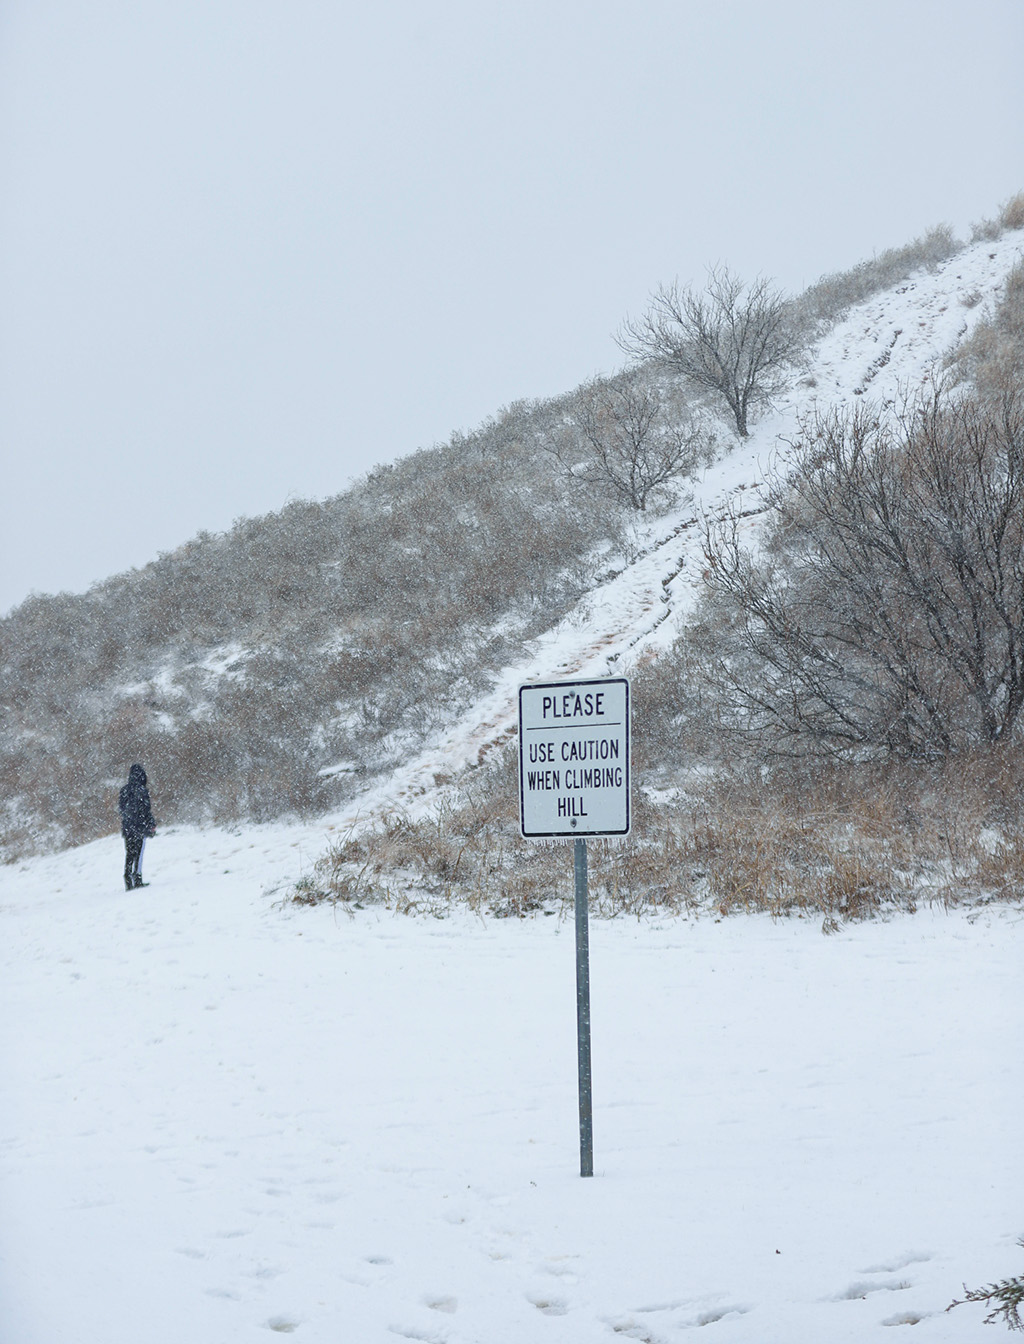 Dangerous Hill